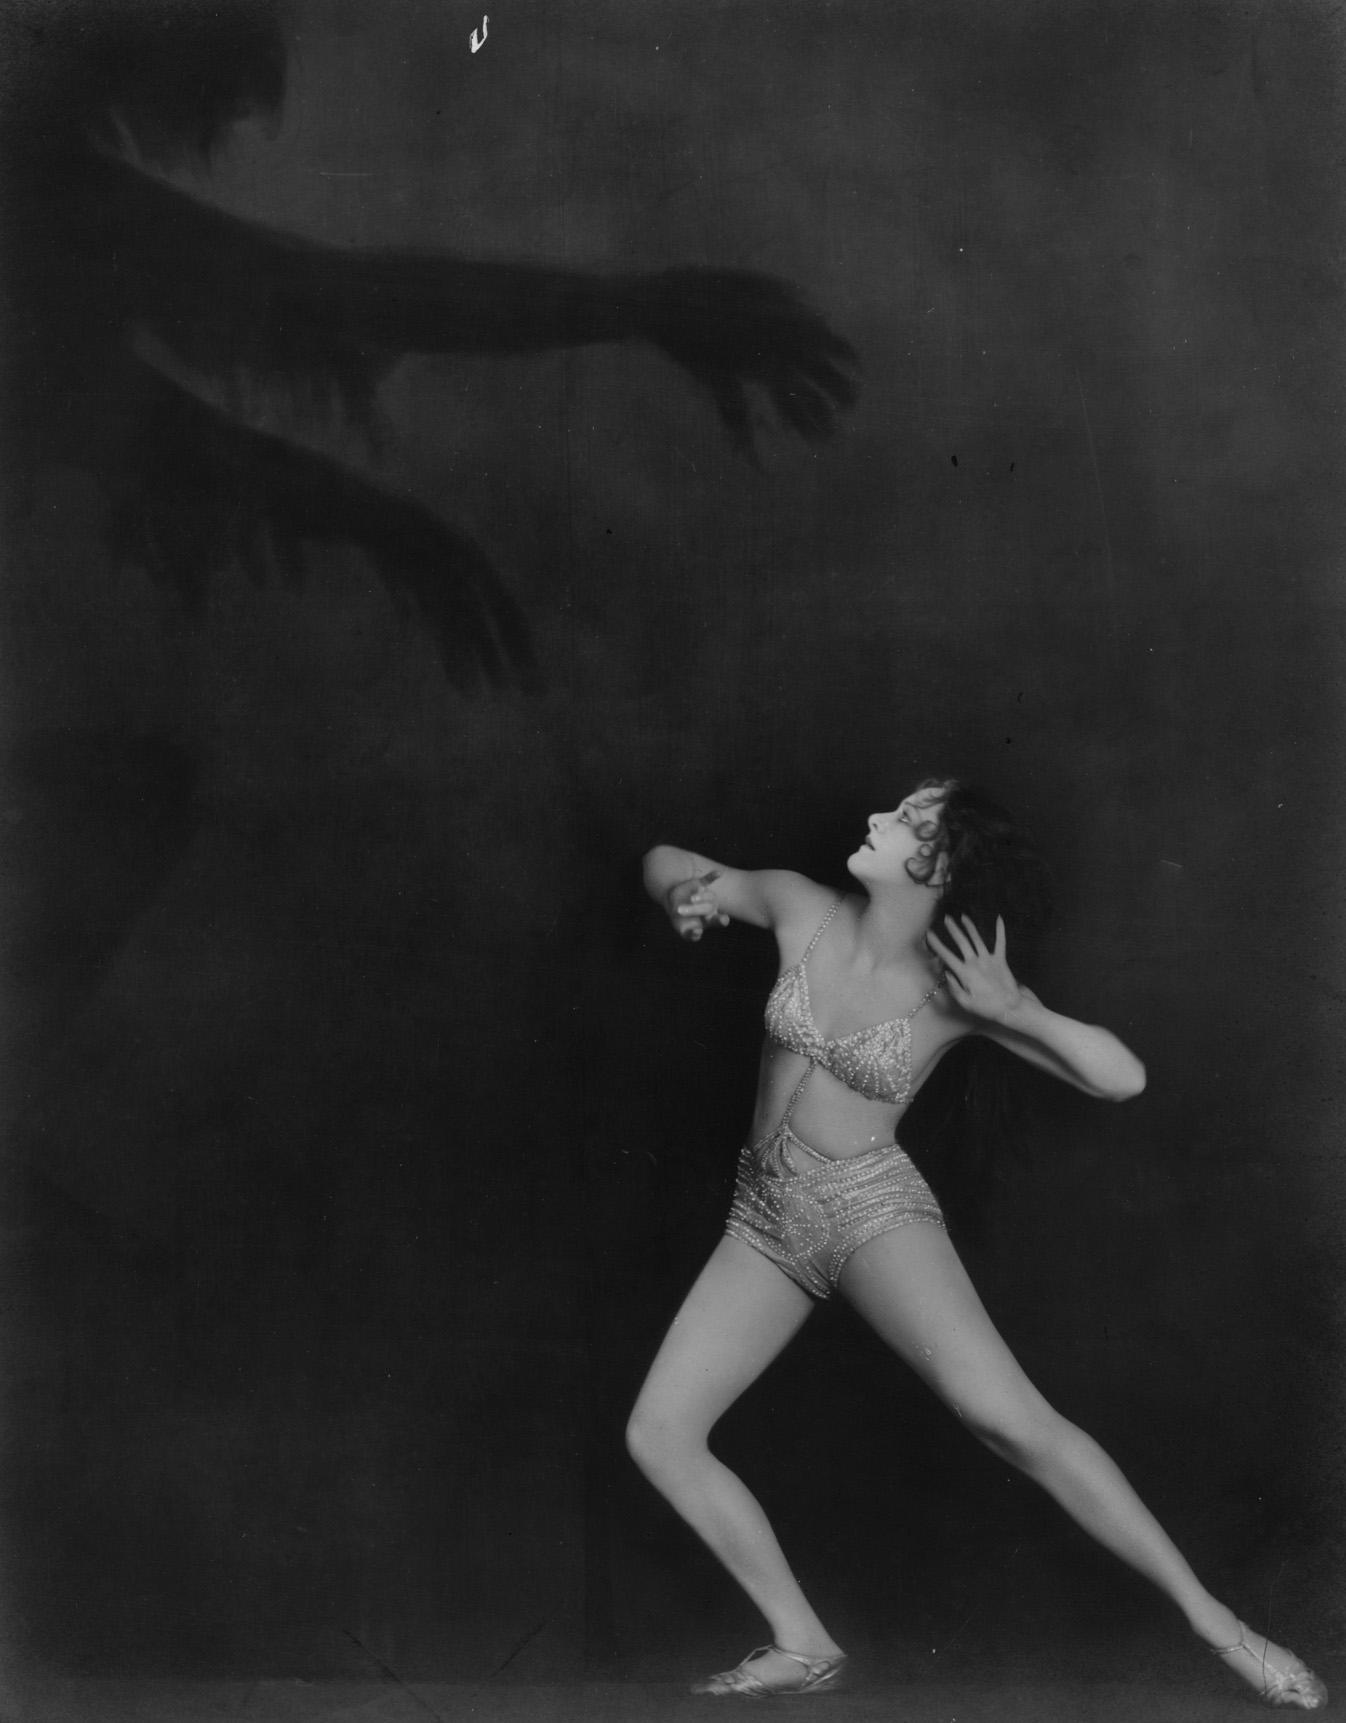 Frightened Dancer fine art photography